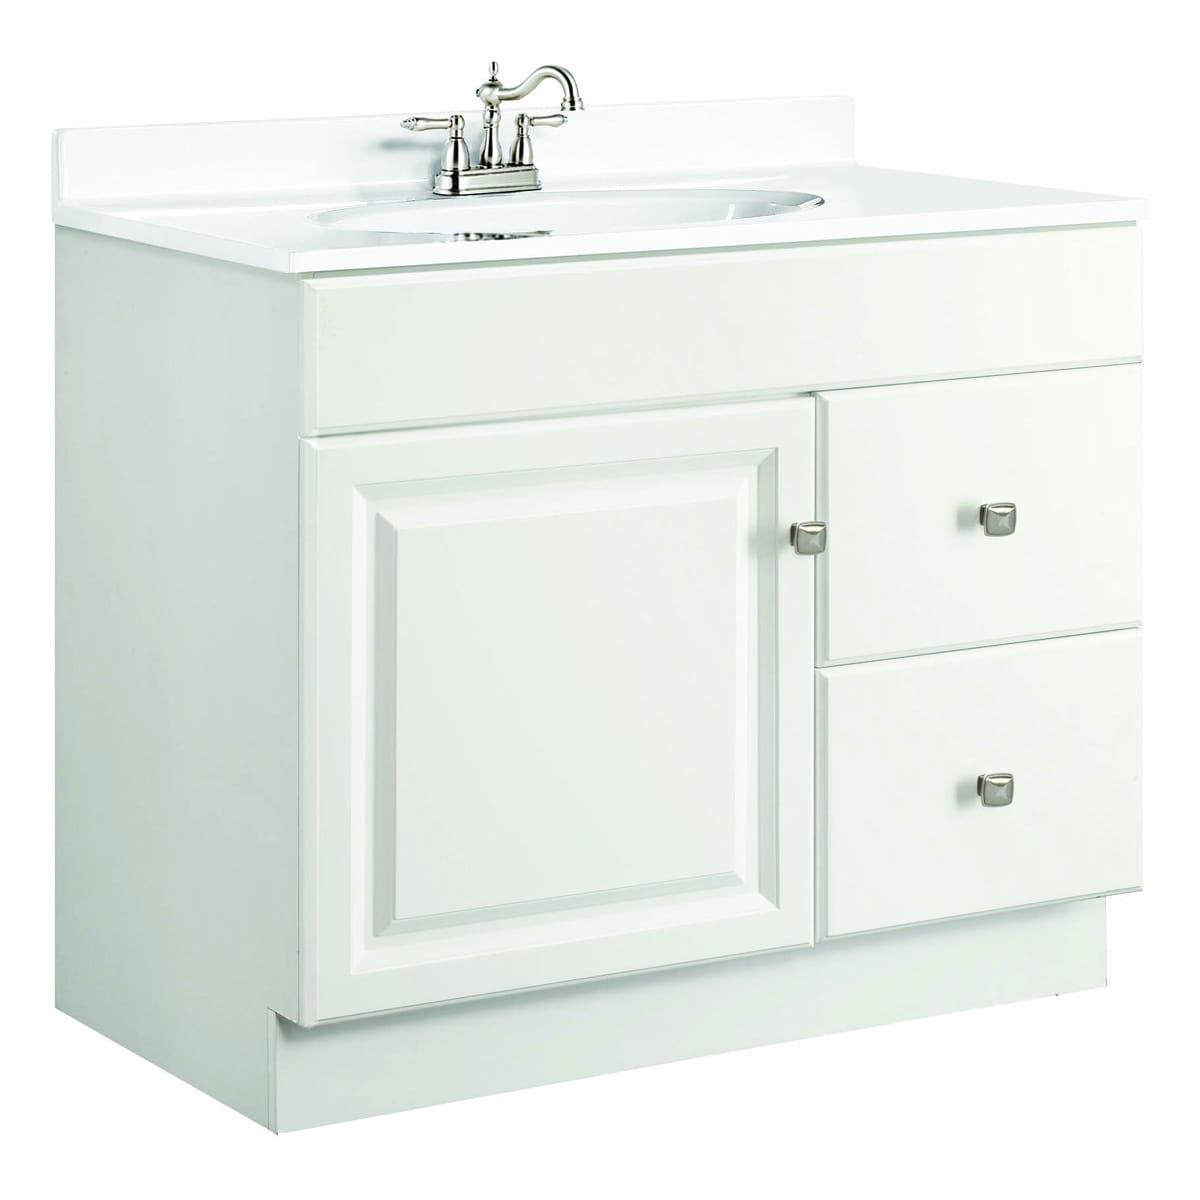 Shop Design House Wyndham White Semi-gloss Vanity Cabinet - Free ...